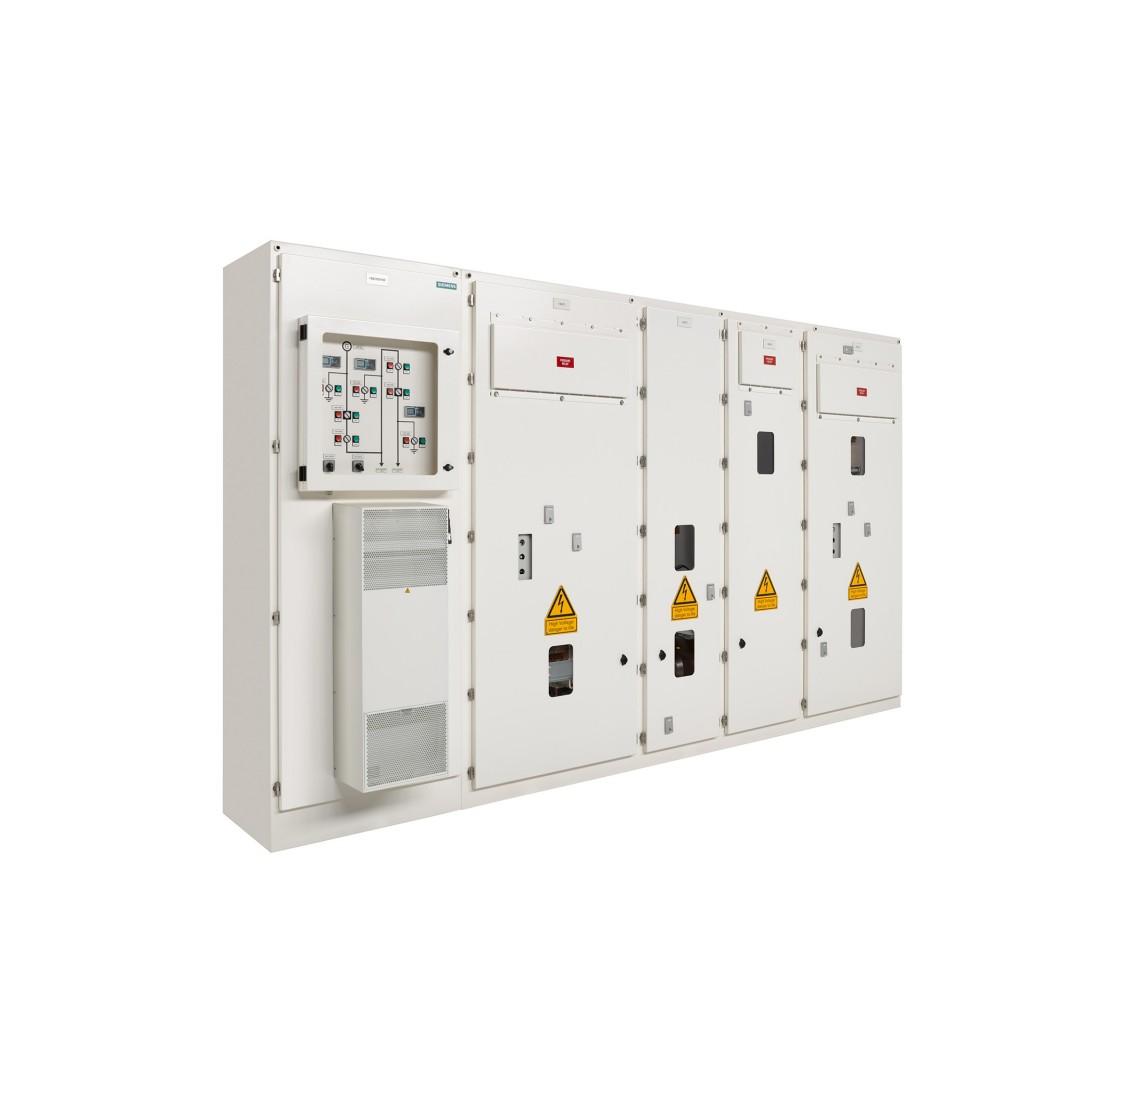 HIGS Generator switchgear HIGS GBS HIGS GCB Generator switchgear up to 72 kA Generator switchgear for power plant up to 70 MW HIGS Generatorschaltanlage Generatorschaltanlage bis zu 72 kA Generatorschaltanlage für Kraftwerke bis 70 MW